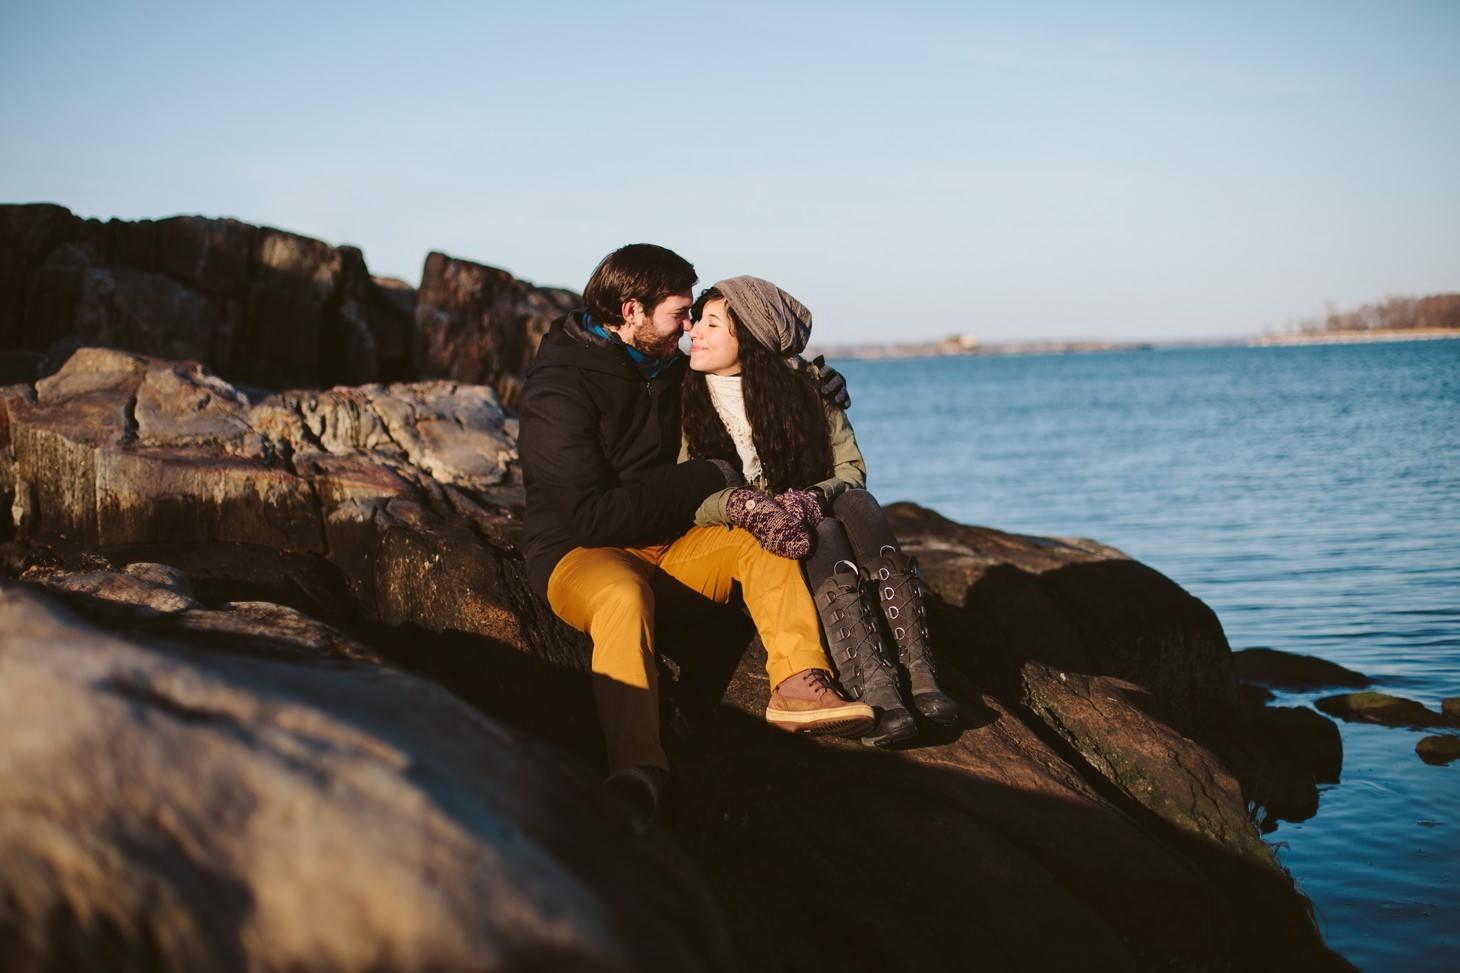 034-nyc-wedding-photographer-orchard-beach-bronx-engagement-winter-smitten-chickens.jpg